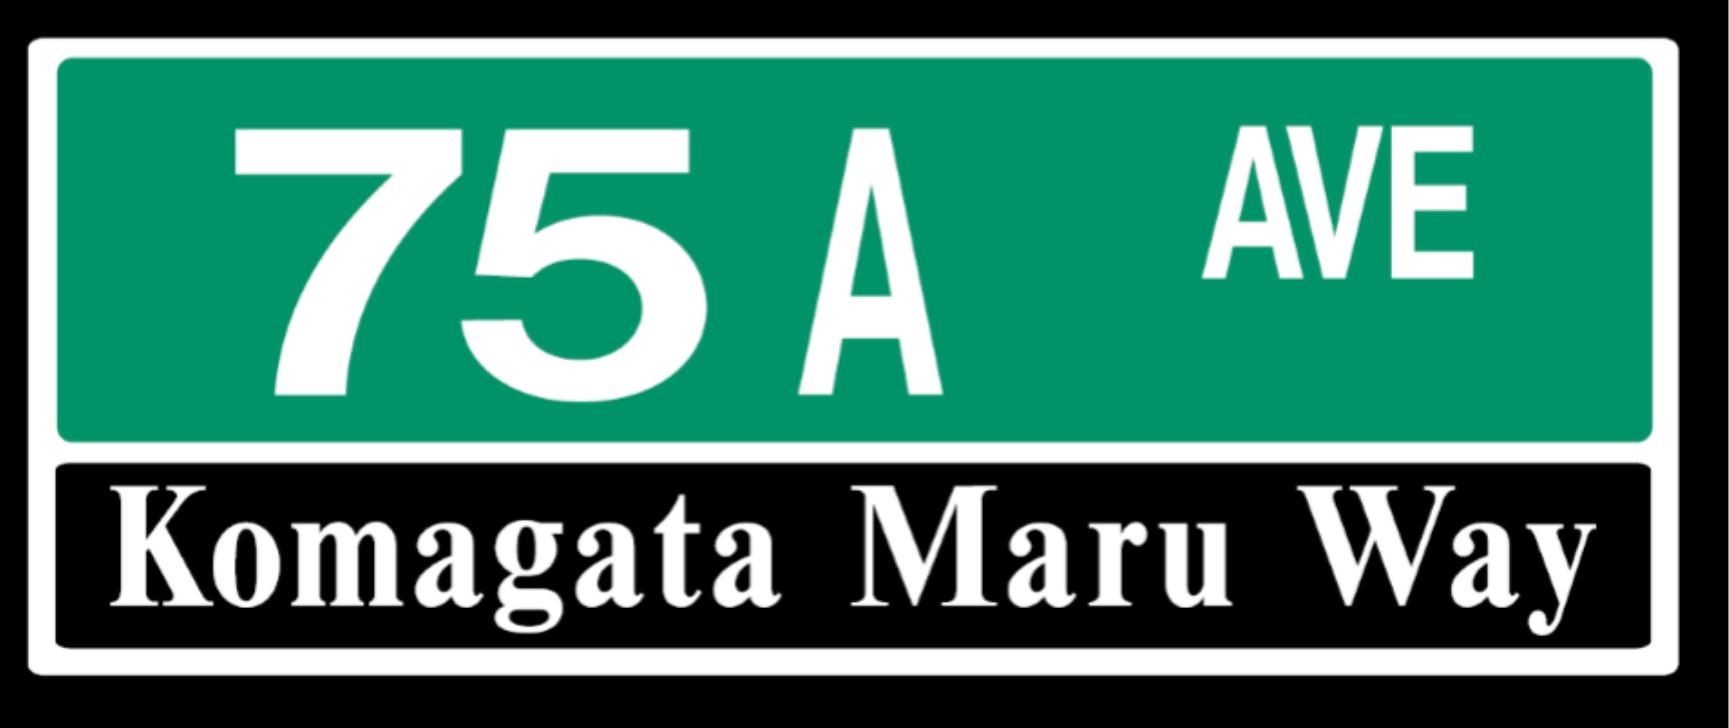 City Council renames Surrey street to commemorate Komagata Maru victims